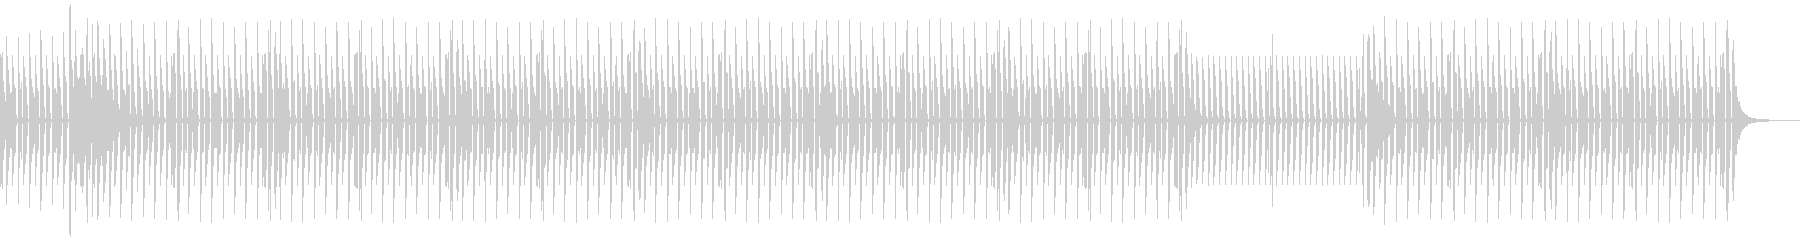 News5 ドラムのみバージョンの未再生の波形